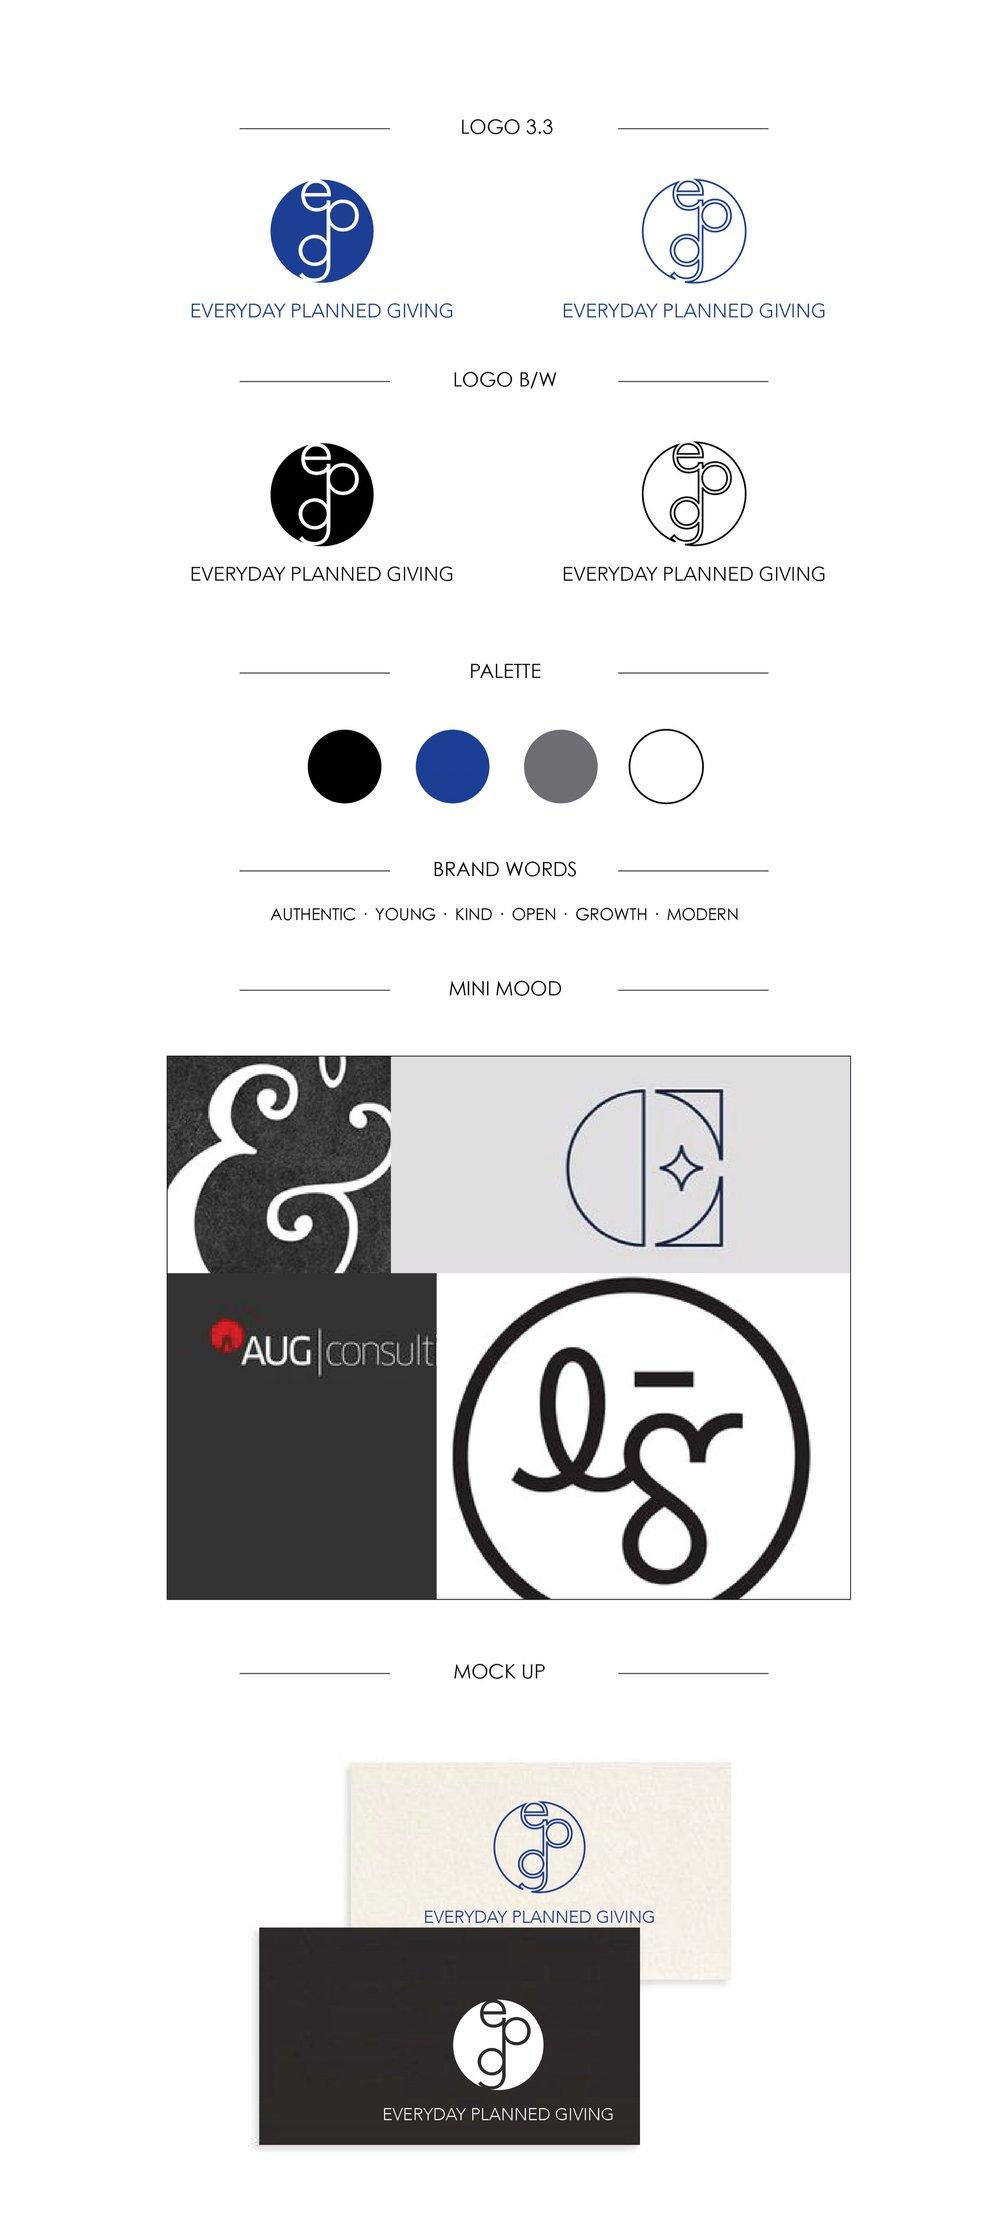 051817_everyday_planned_giving_logo-01.jpg